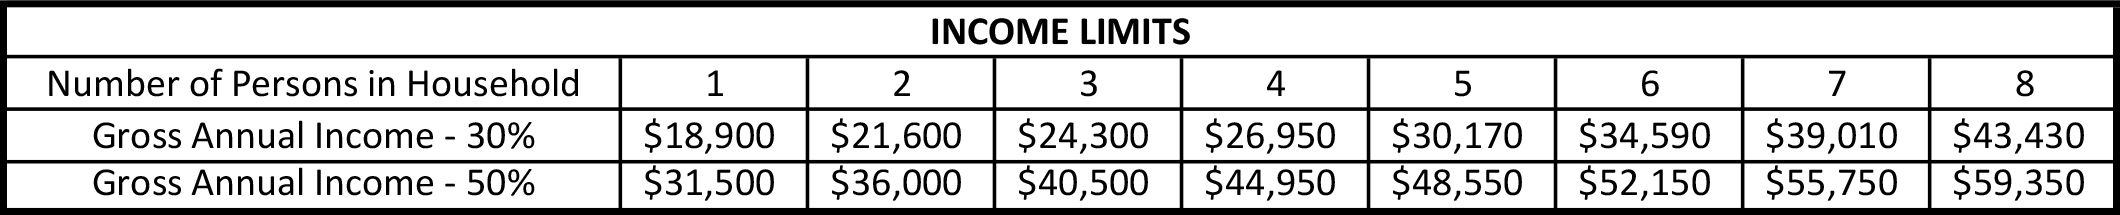 Income_Limits_2019_English.jpg